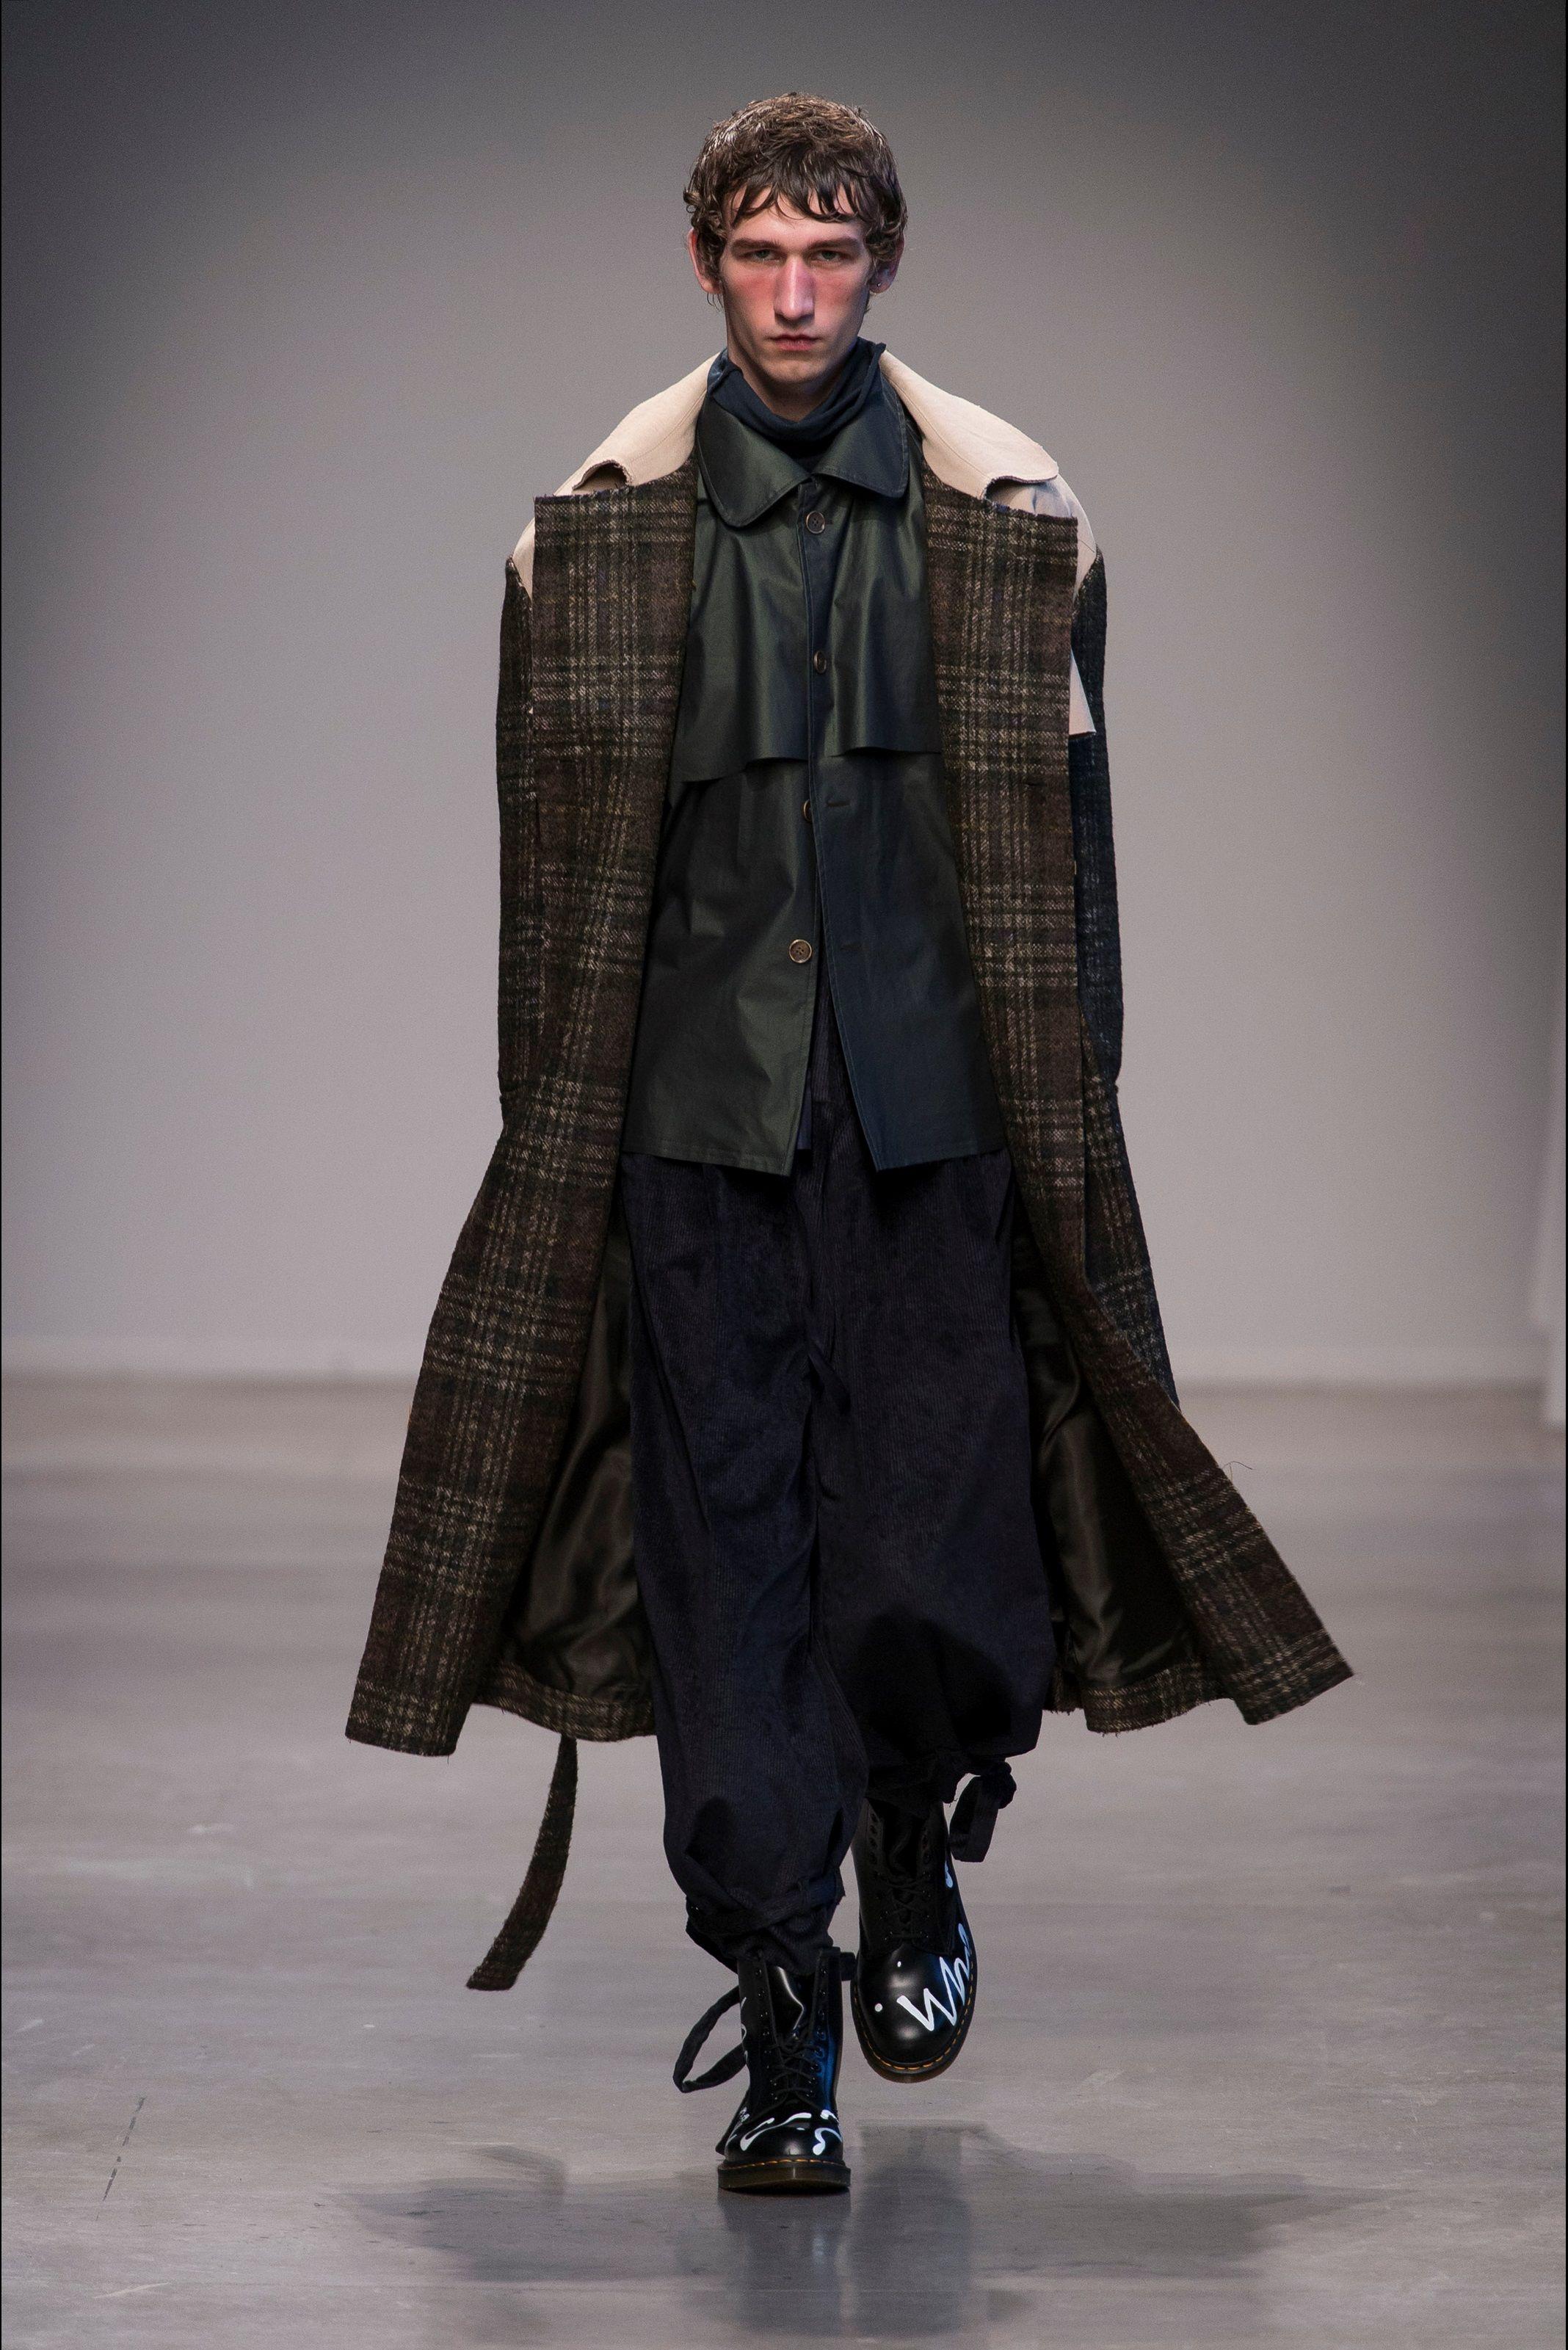 Sfilata Moda Uomo Miaoran Milano - Autunno Inverno 2017-18 - Vogue ... 2045a27d755